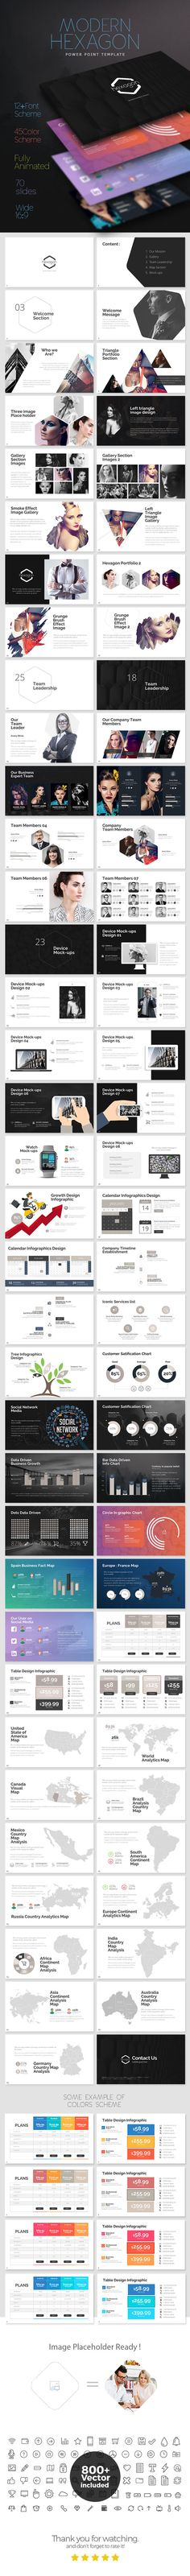 Modern Hexagon Powerpoint Template — Powerpoint PPTX #info graphics #seo • Download ➝ https://graphicriver.net/item/modern-hexagon-powerpoint-template/19188291?ref=pxcr